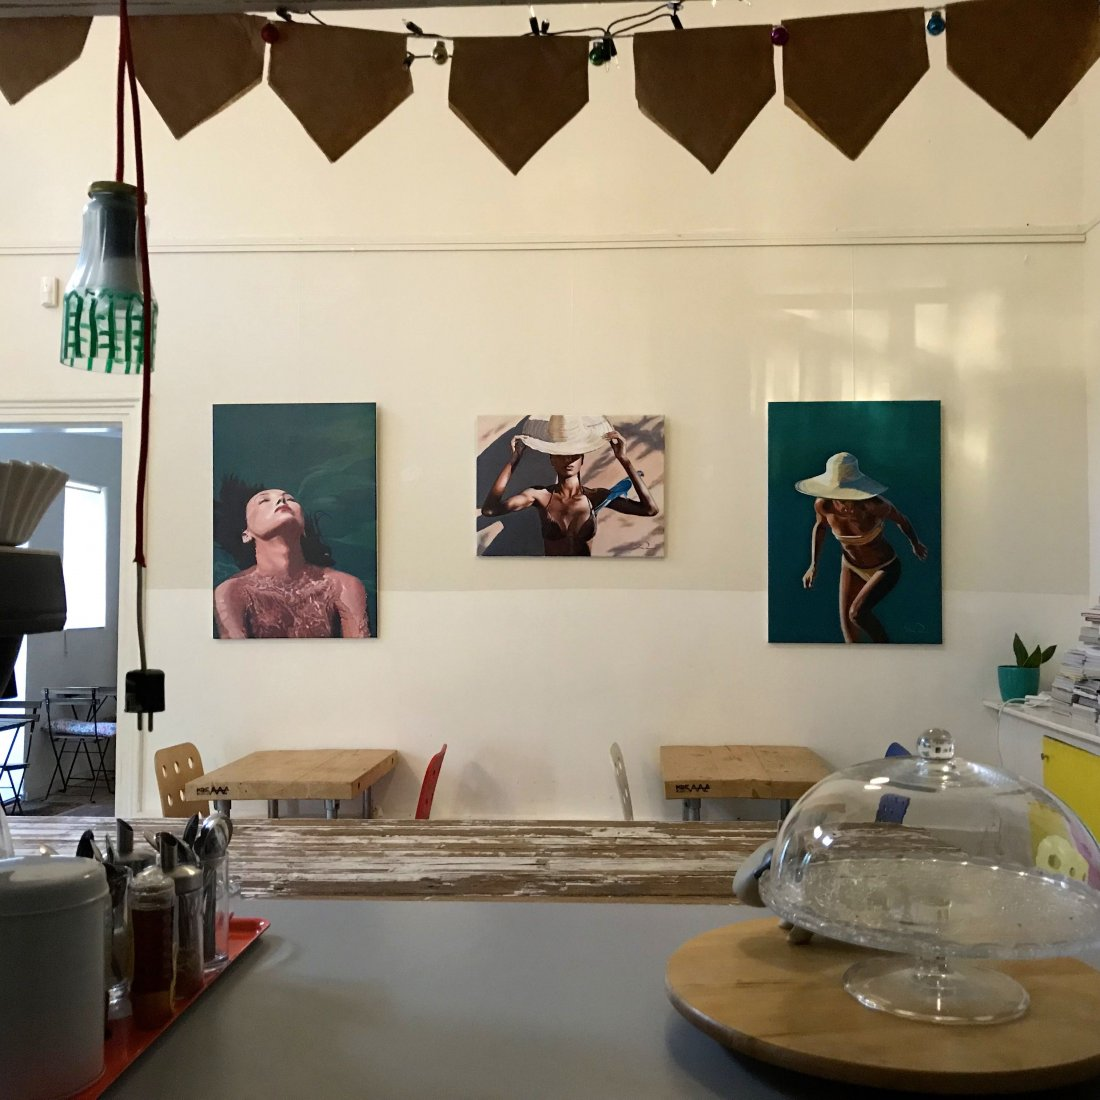 antoinerenault-amsterdam-exhibition-art-thethinkinghut-7